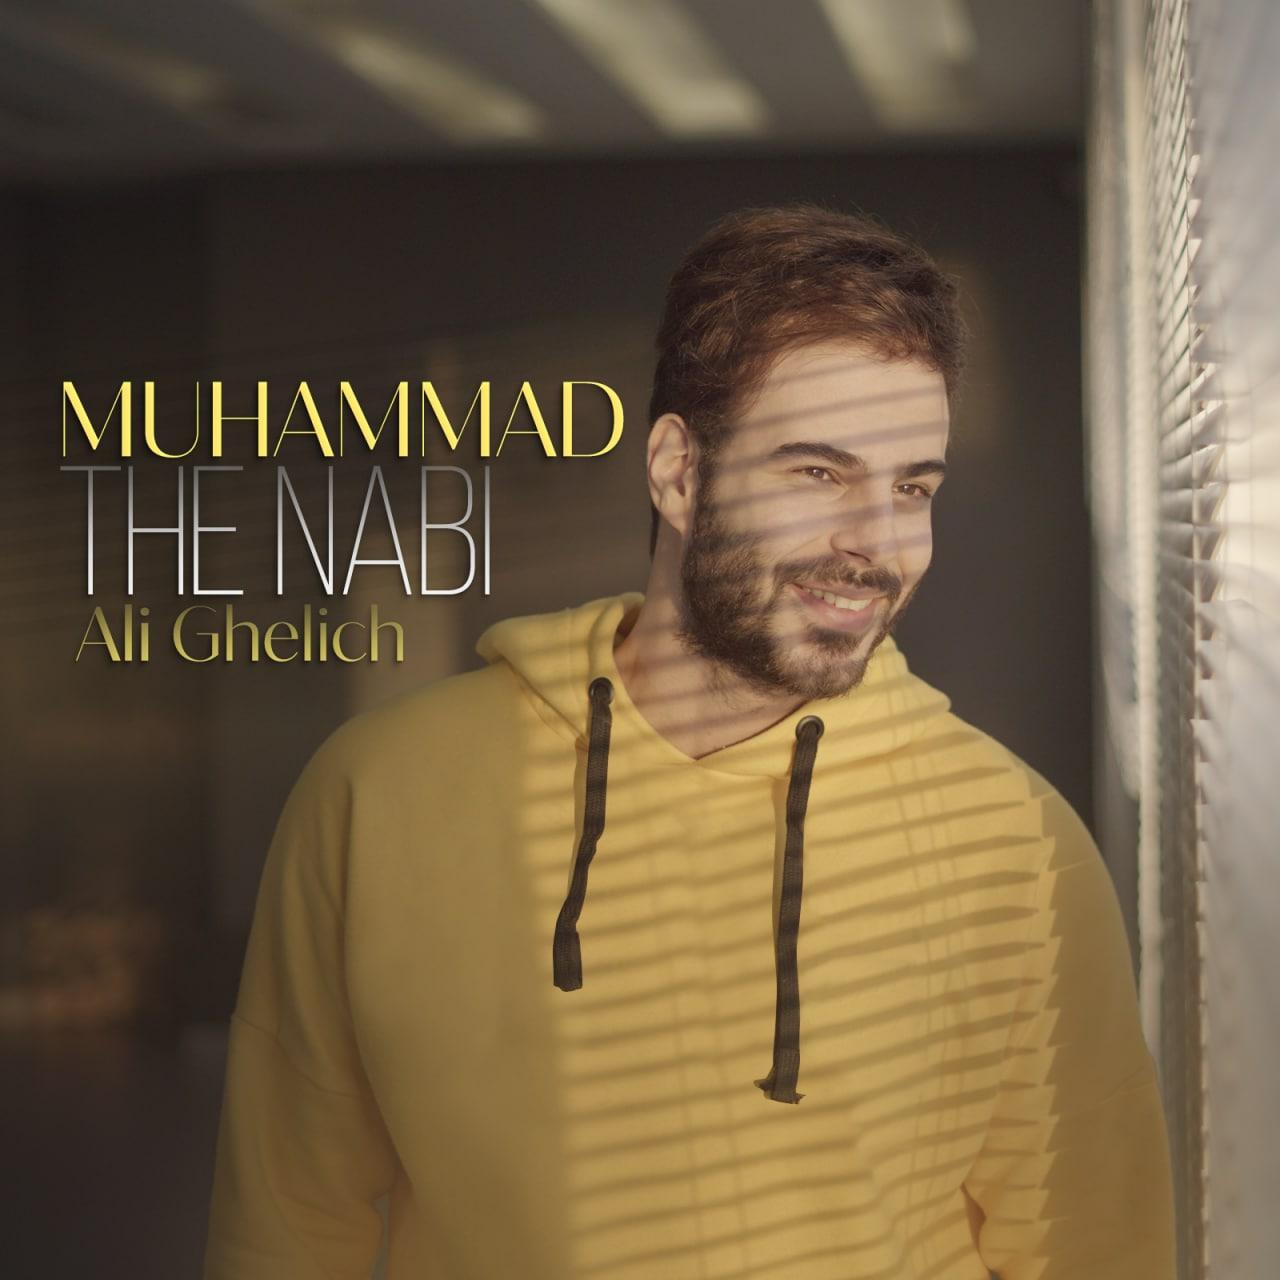 Muhammad The Nabi